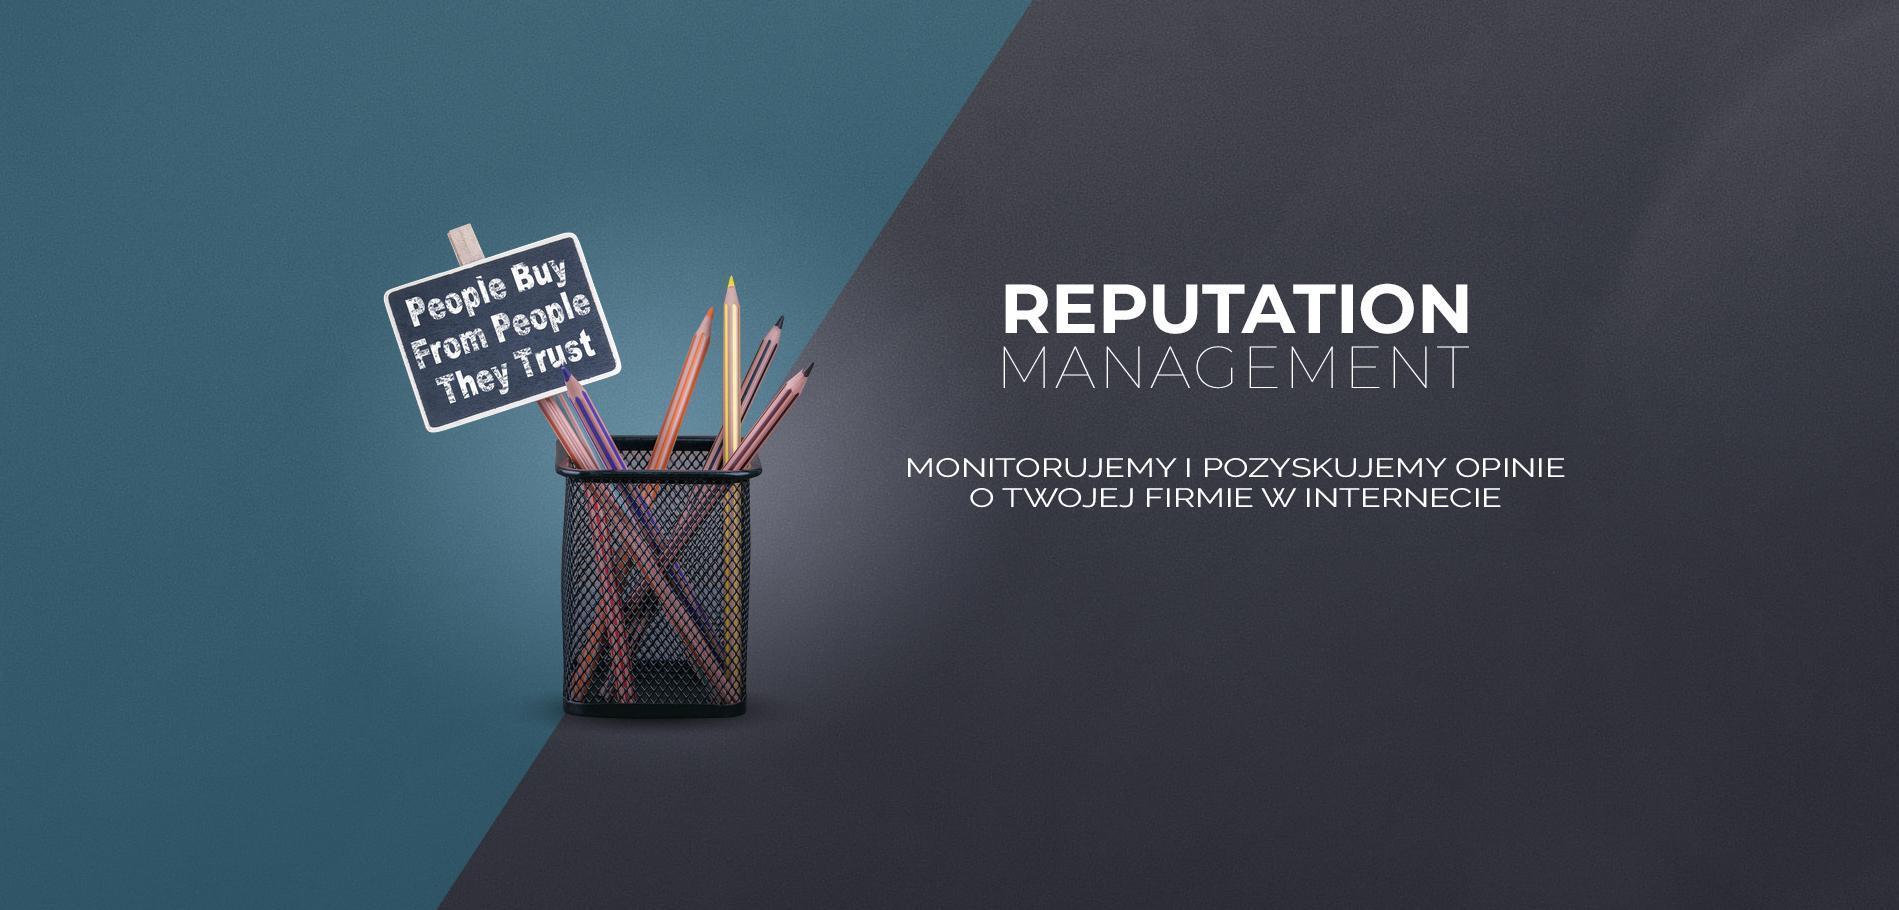 strony internetowe - mixedmedia.pl